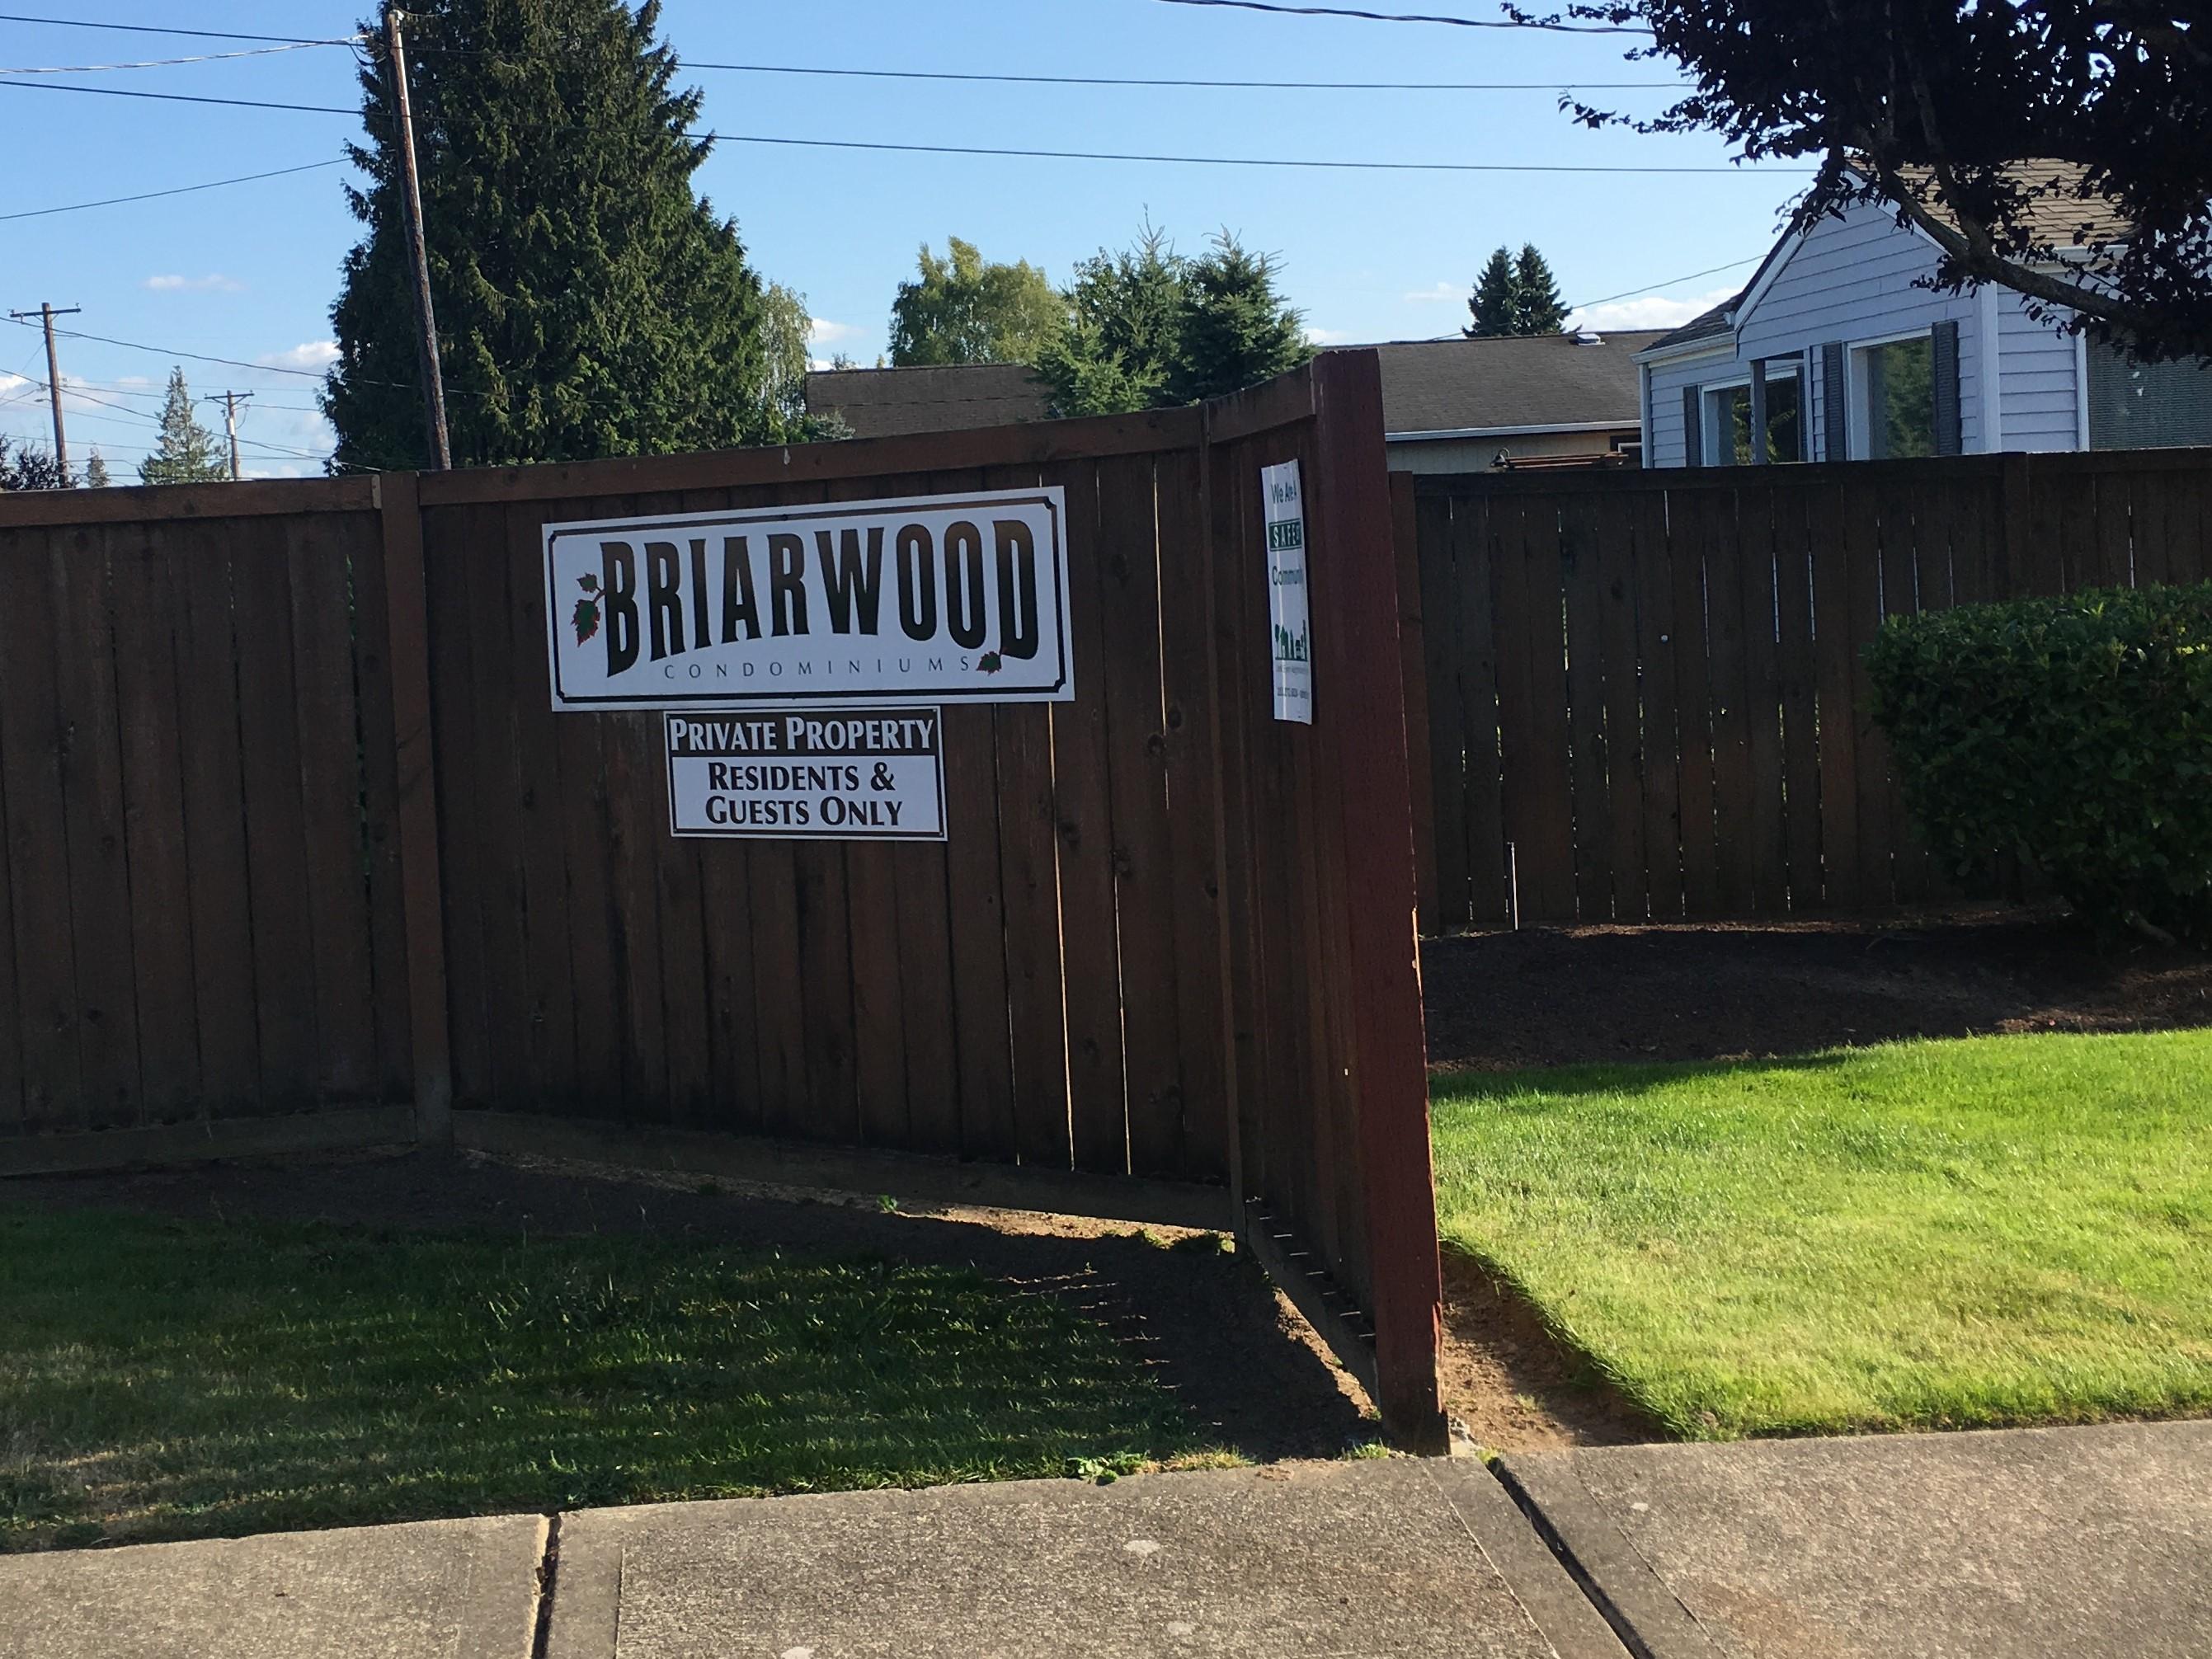 Briarwood Condominiums entrance